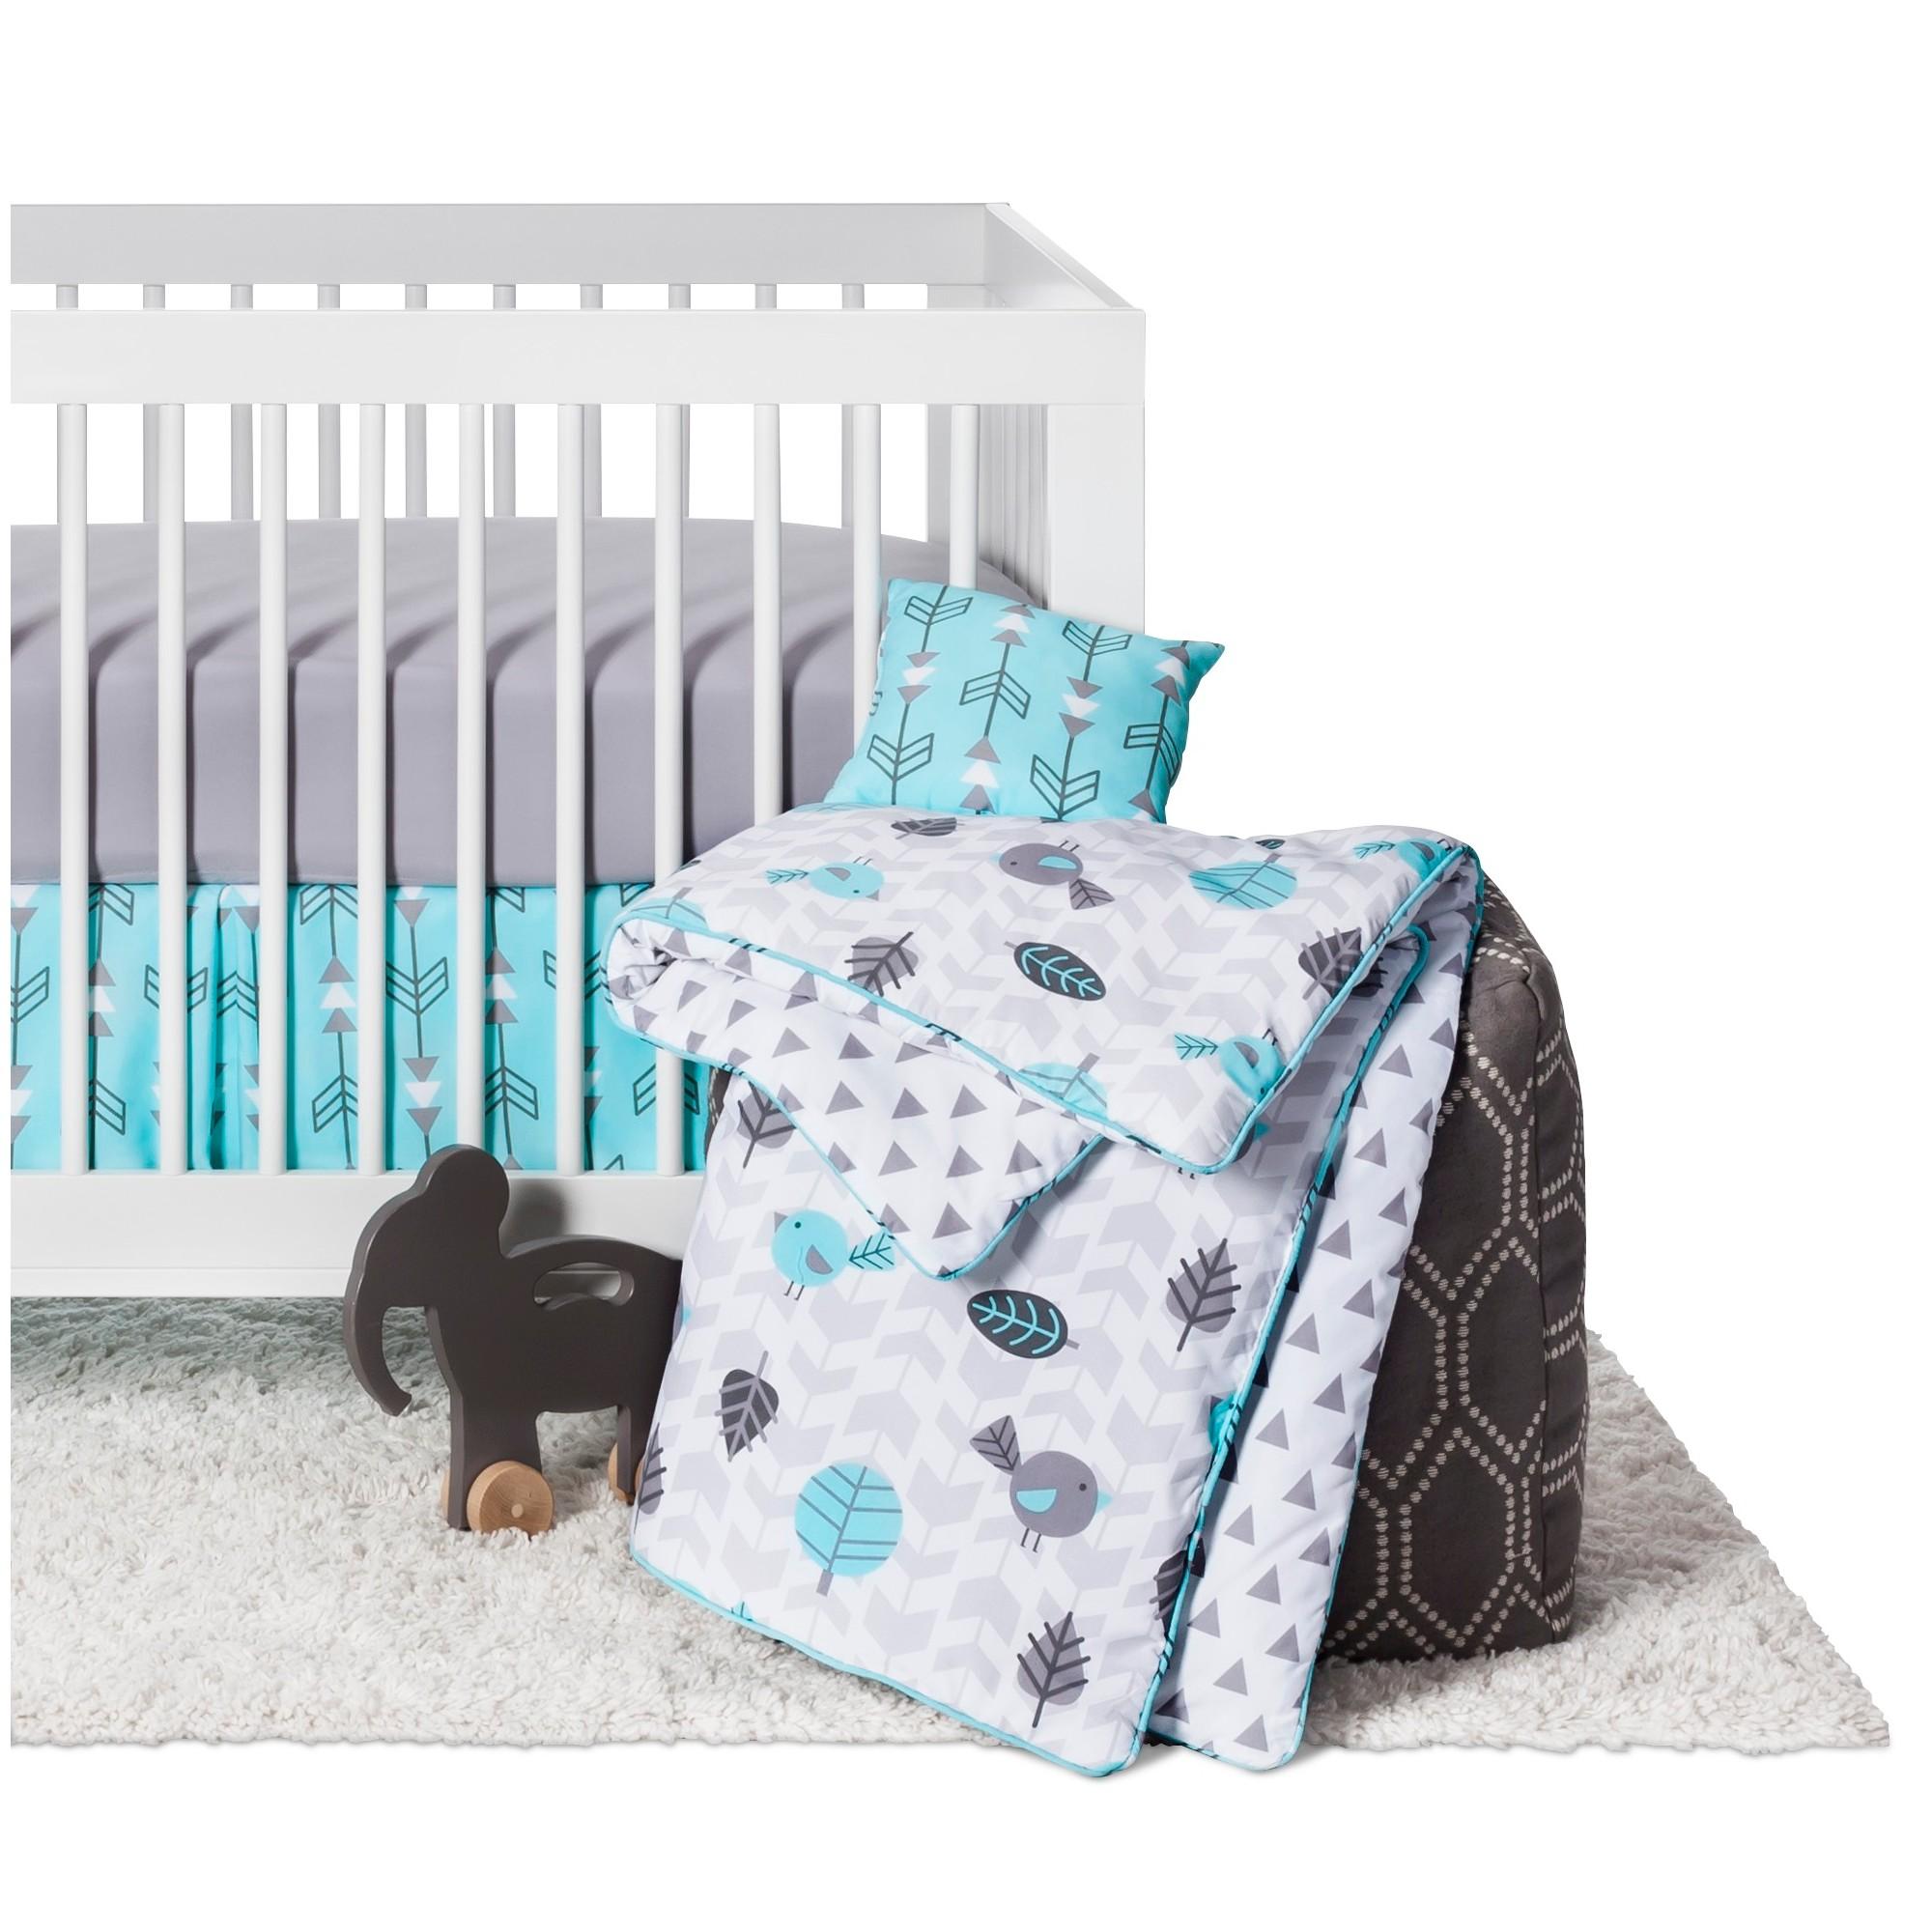 bedding matelasse dot minky piece sweet baby set in white graceful designs jojo cribs nice crib